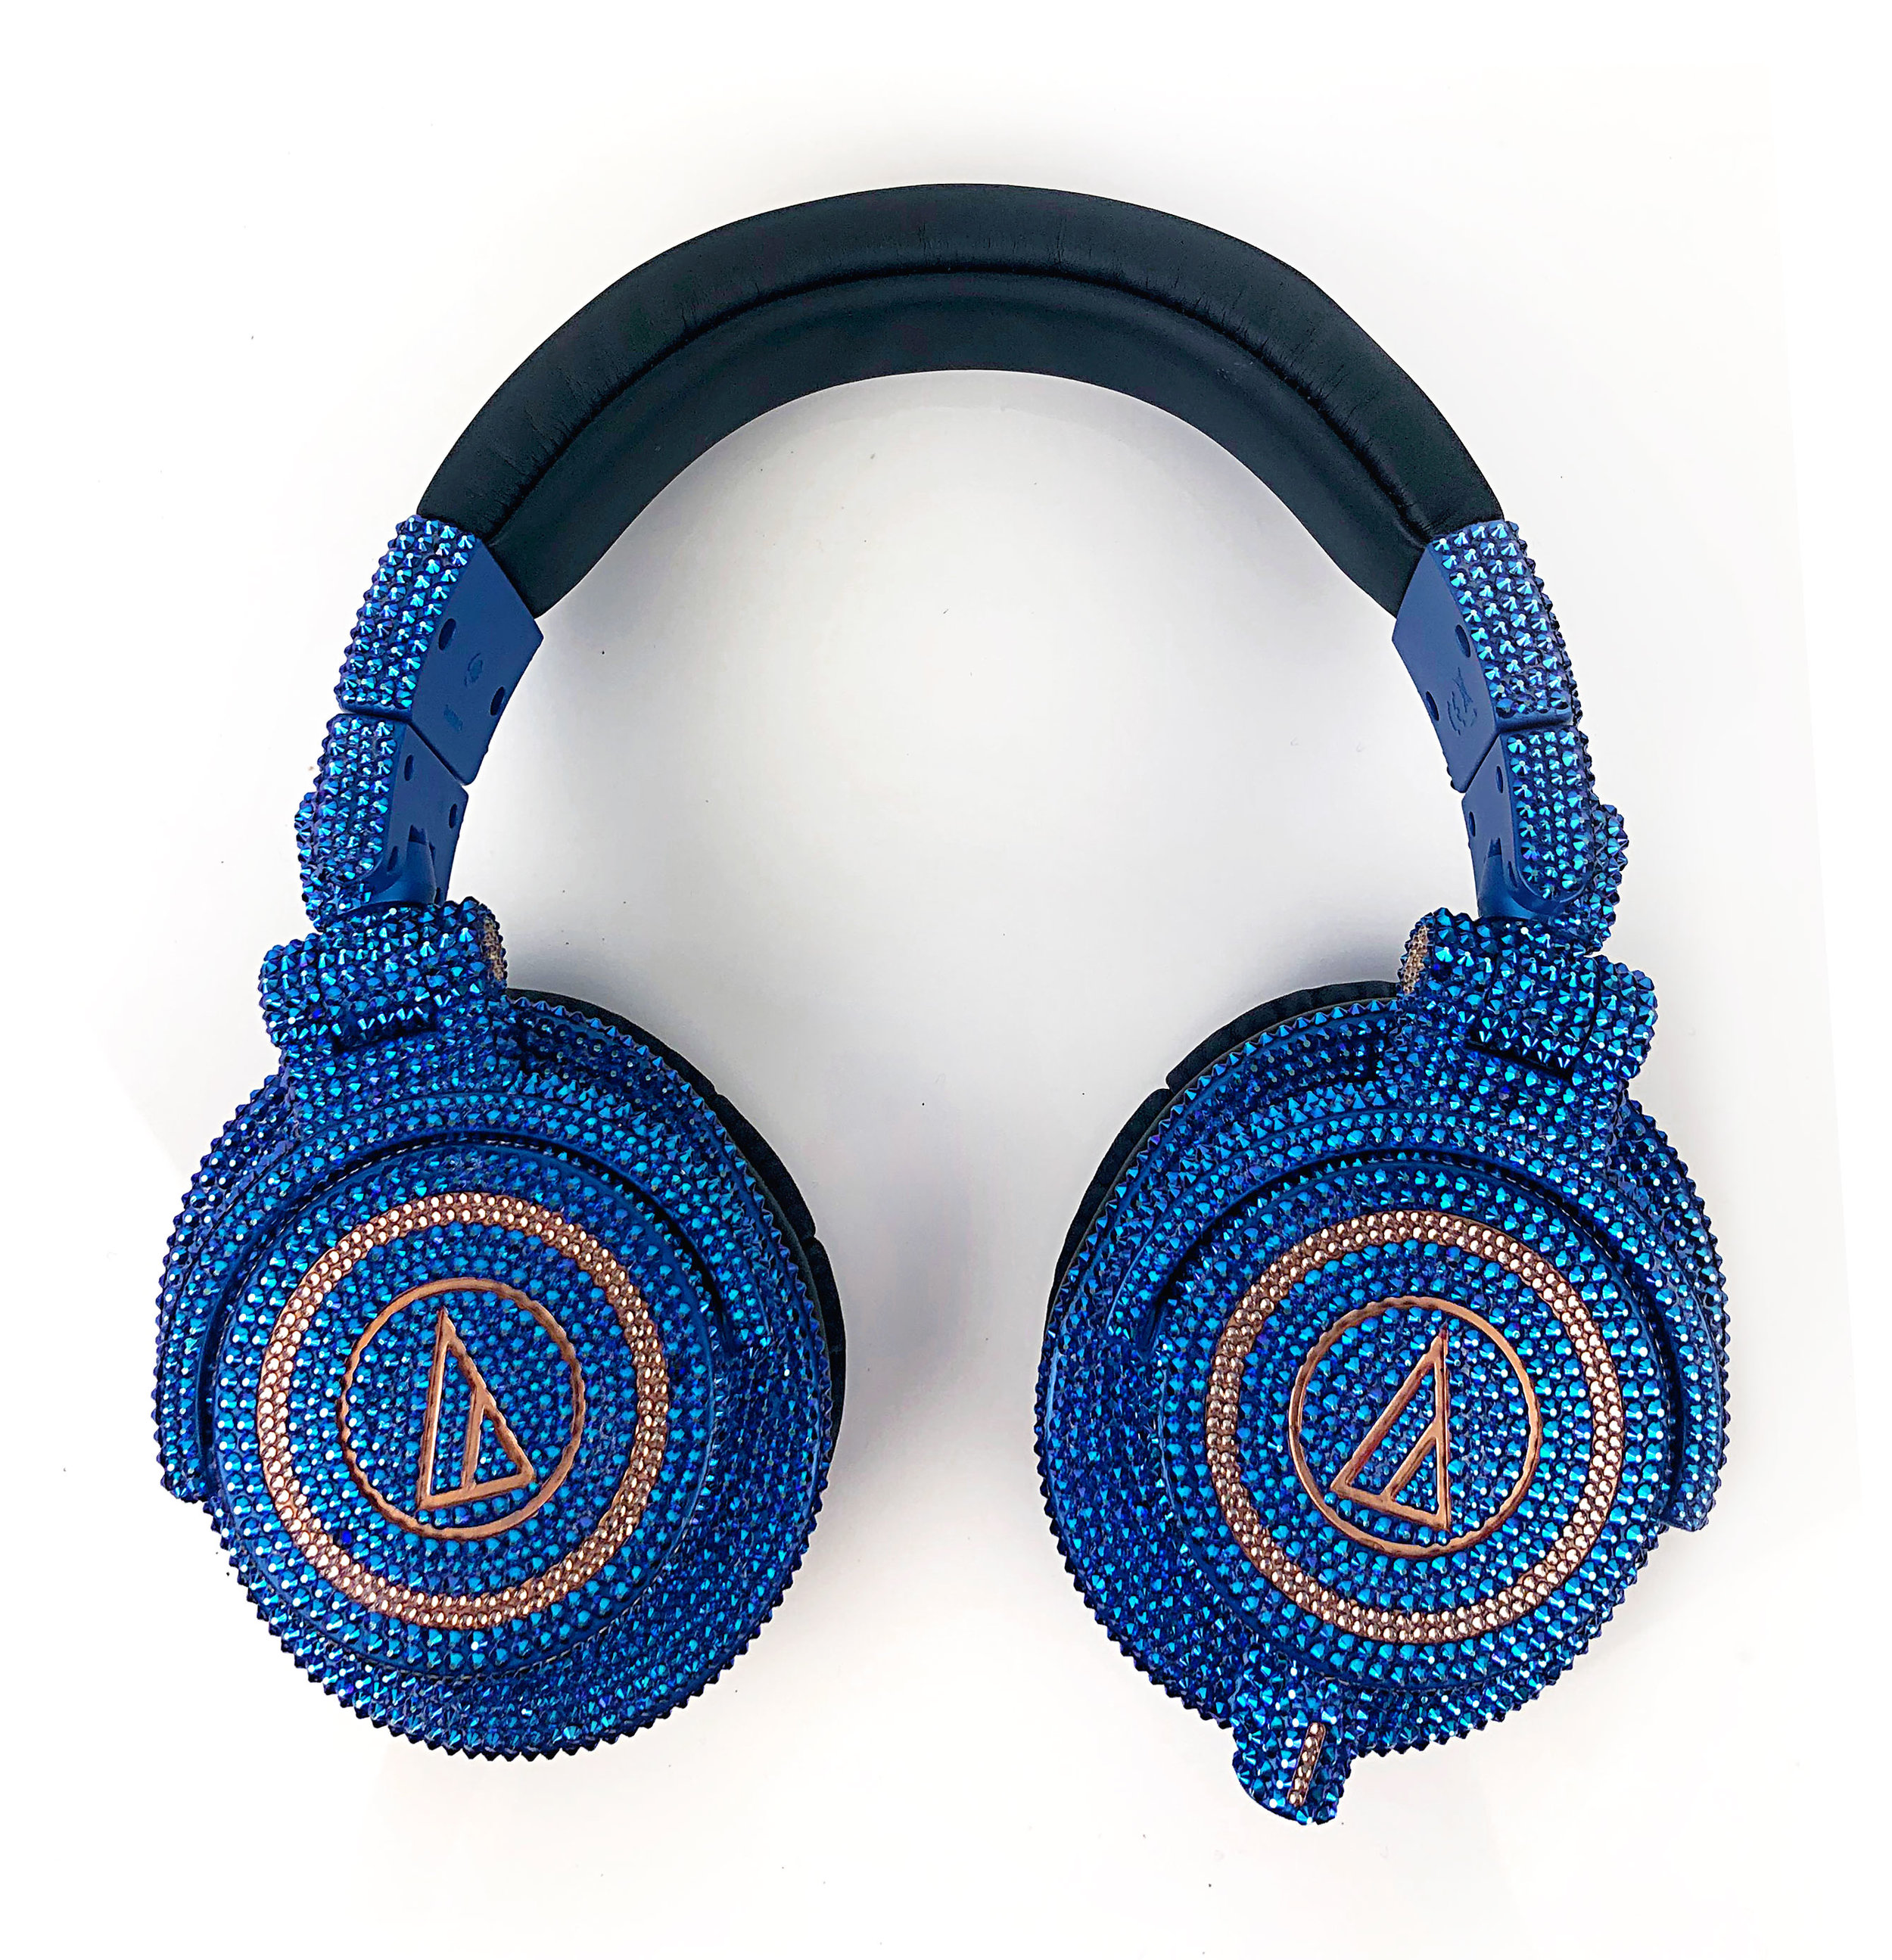 MM_DJ2Face_CustomHeadphones-1.jpg